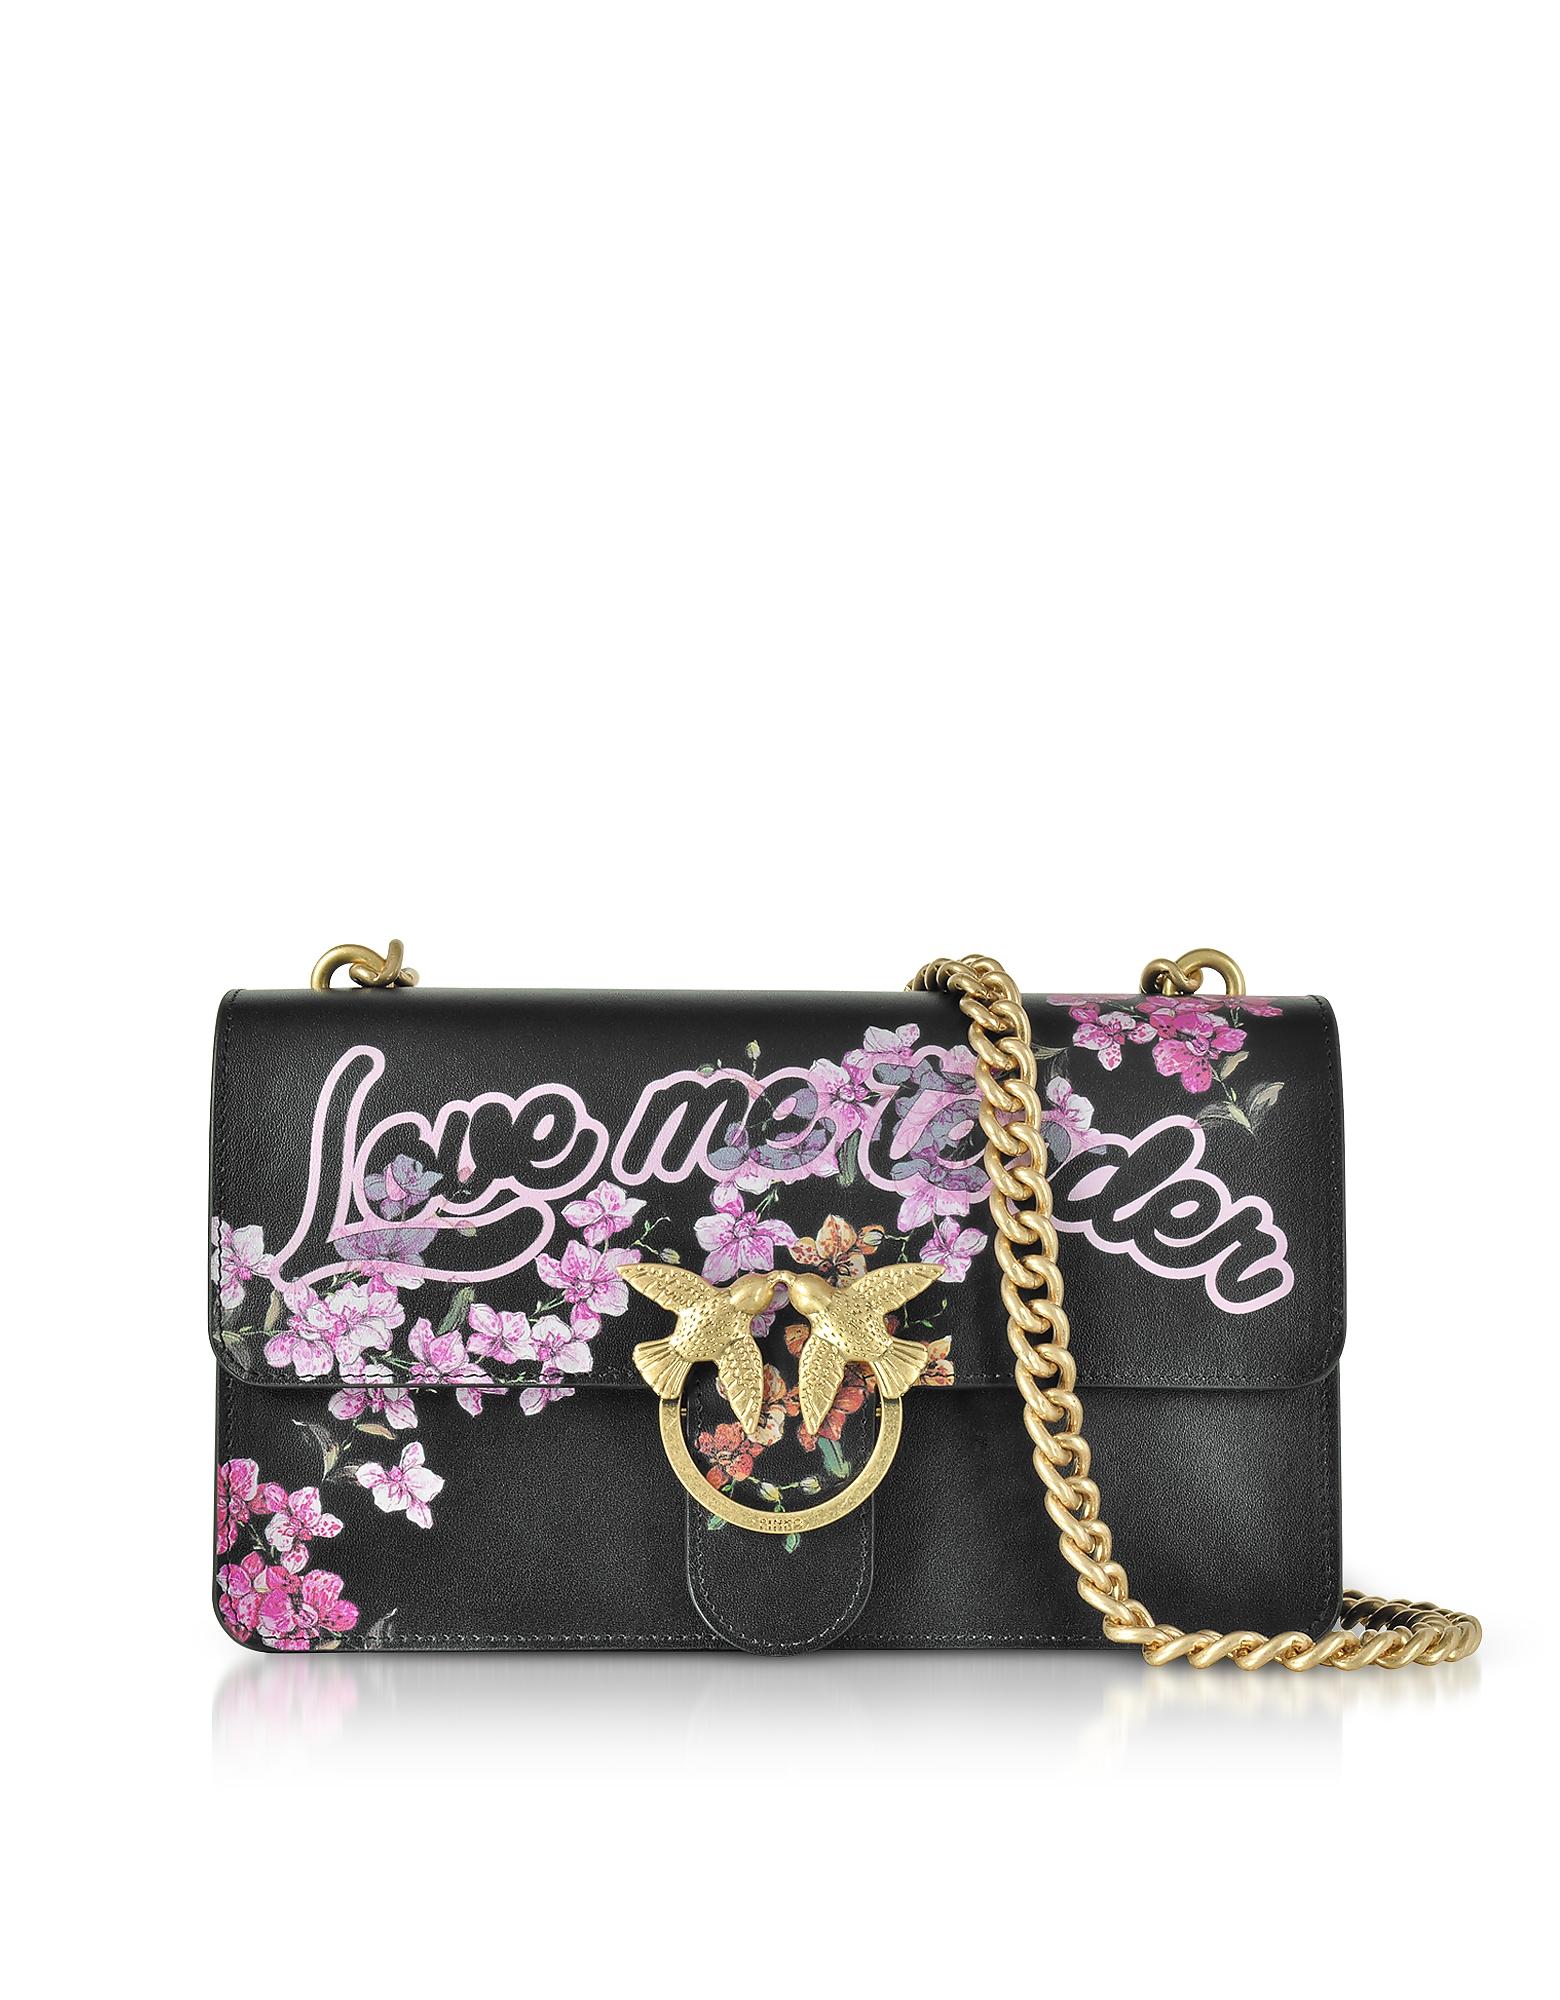 Pinko Handbags, Love Me Tender Flowers Black Eco Leather Shoulder Bag